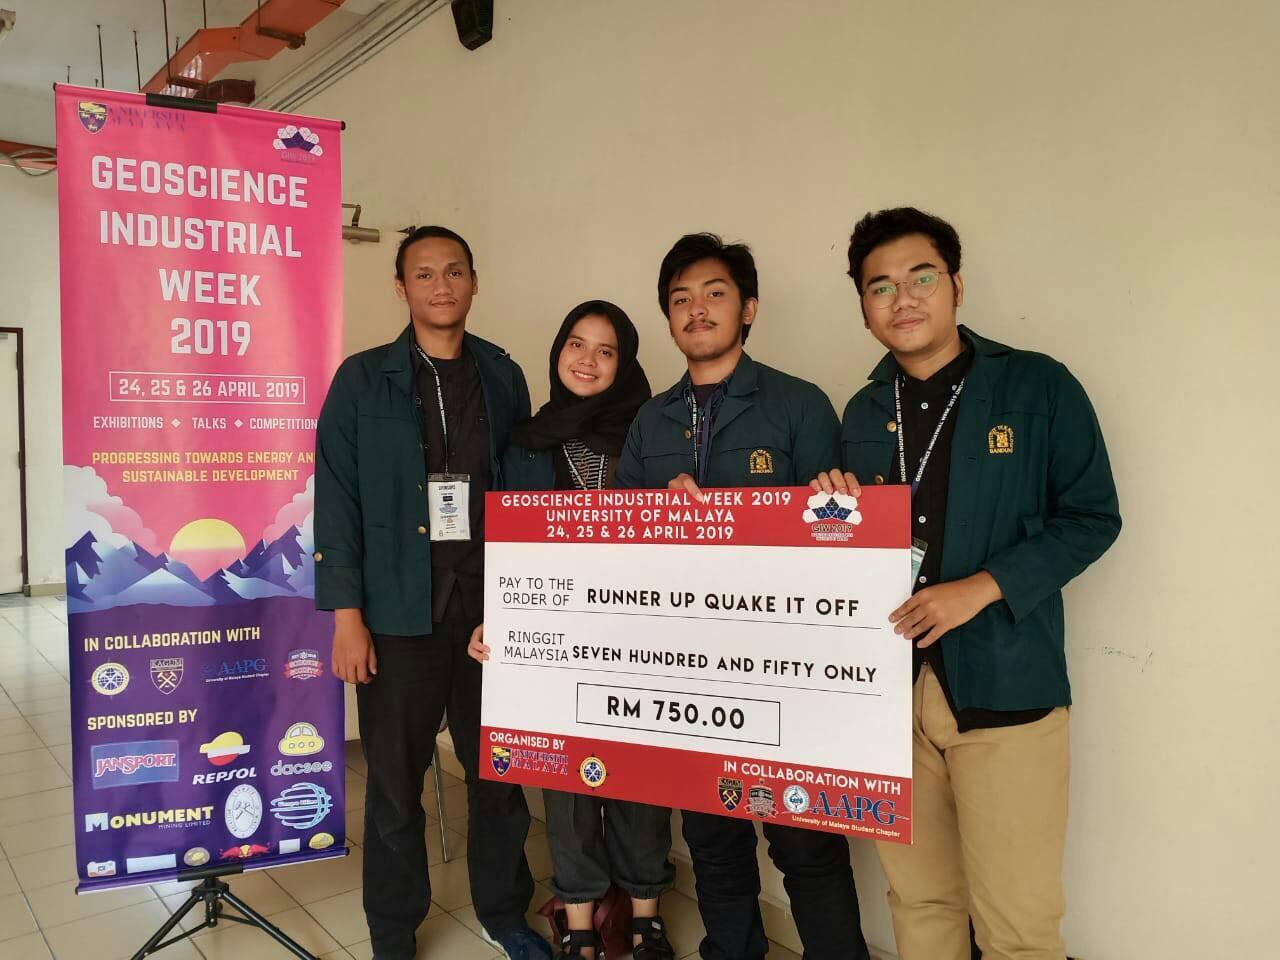 Juara 2 Geoscience Industrial Week, University of Malaya, Malaysia